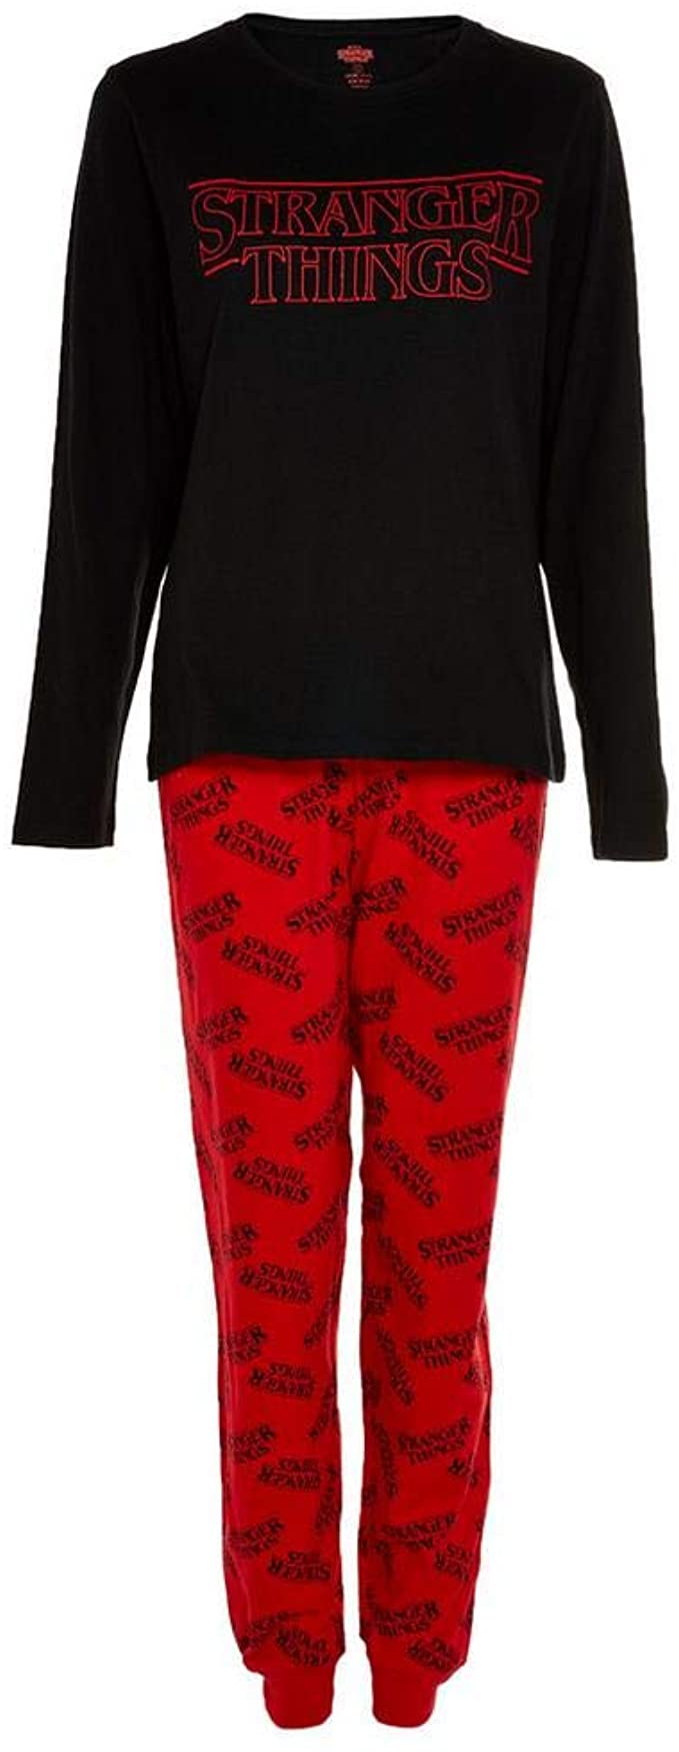 Stranger Things Pyjamas Womens Short OR Long Leg Options PJs